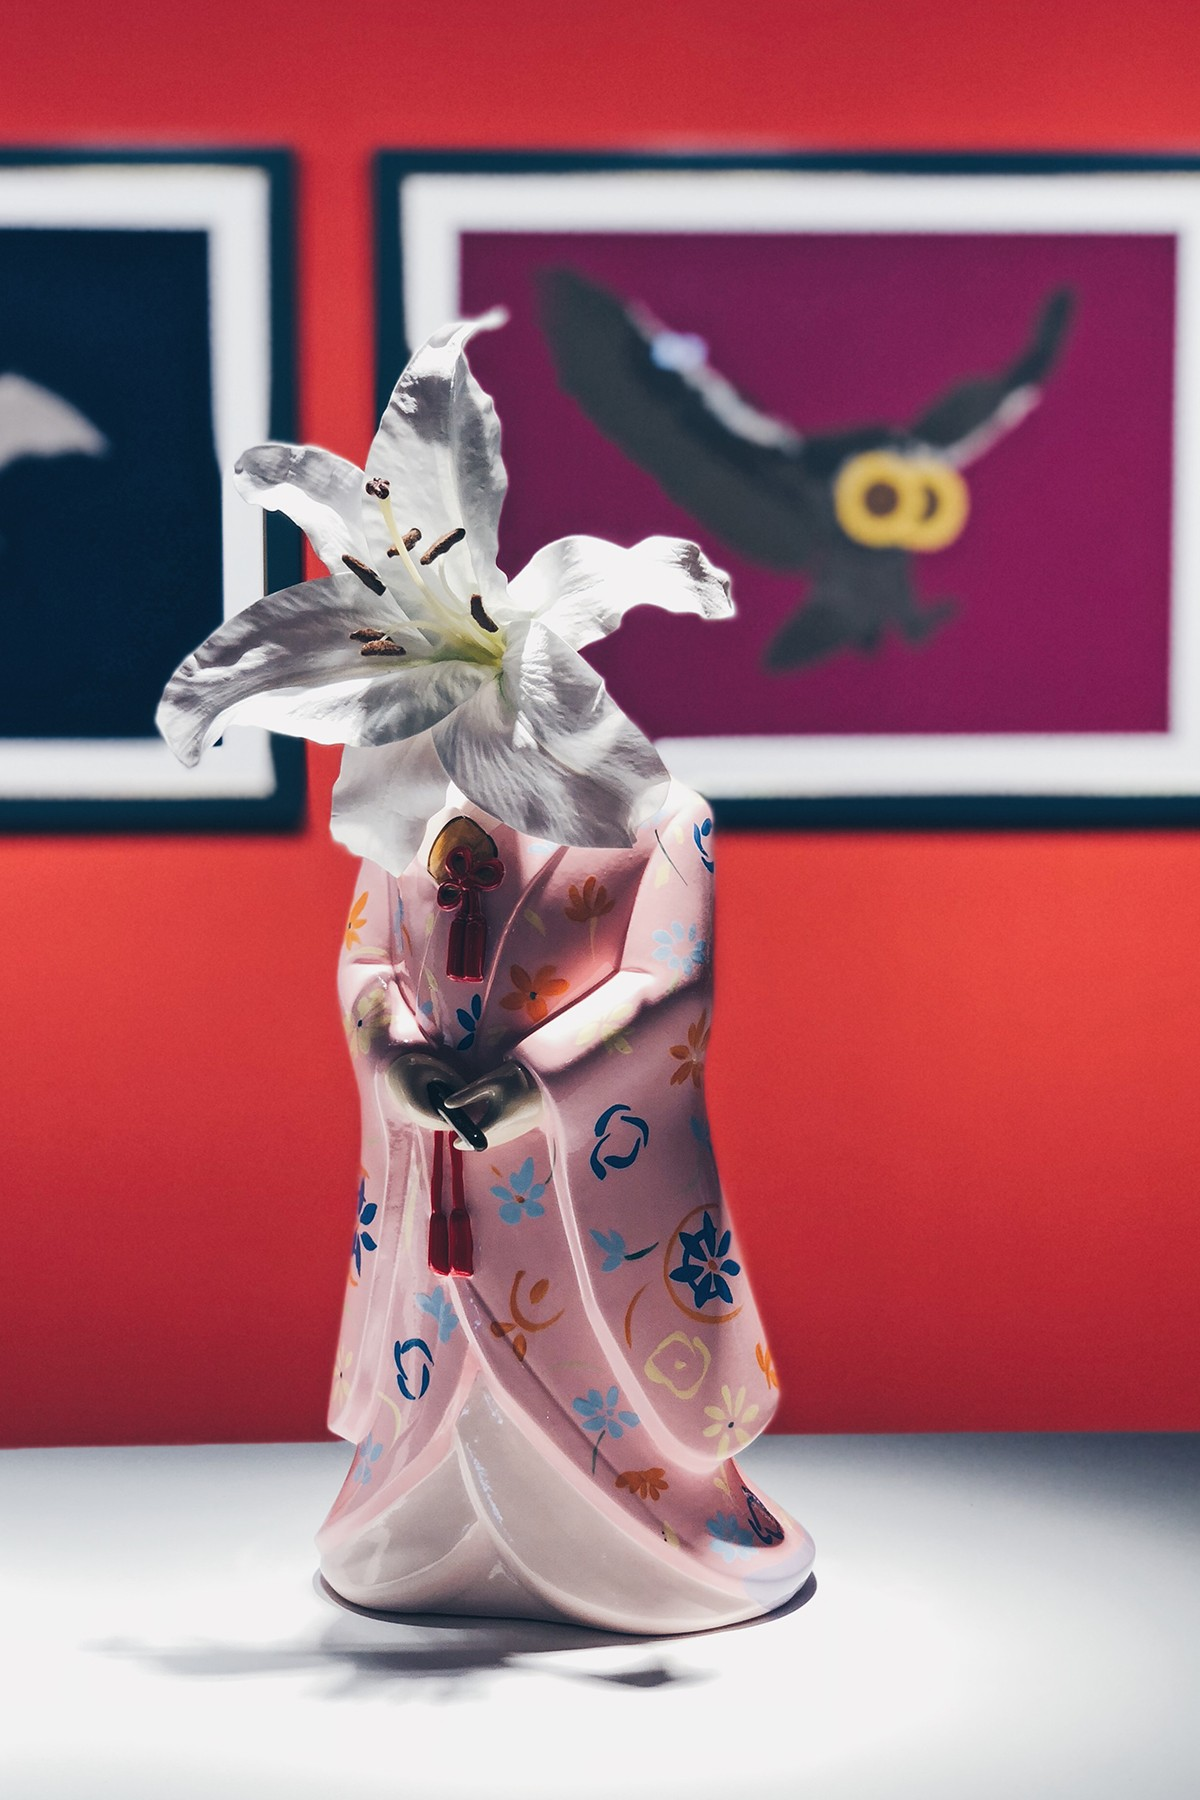 北野武、David Lynch 参上-Cartier 当代艺术基金会《A Beautiful Elsewhere》展览限定开展 -https%3A%2F%2Fhk.hypebeast.com%2Ffiles%2F2018%2F06%2Ffondation-cartier-pour-lart-contemporain-shanghai-a-beautiful-elsewhere-15